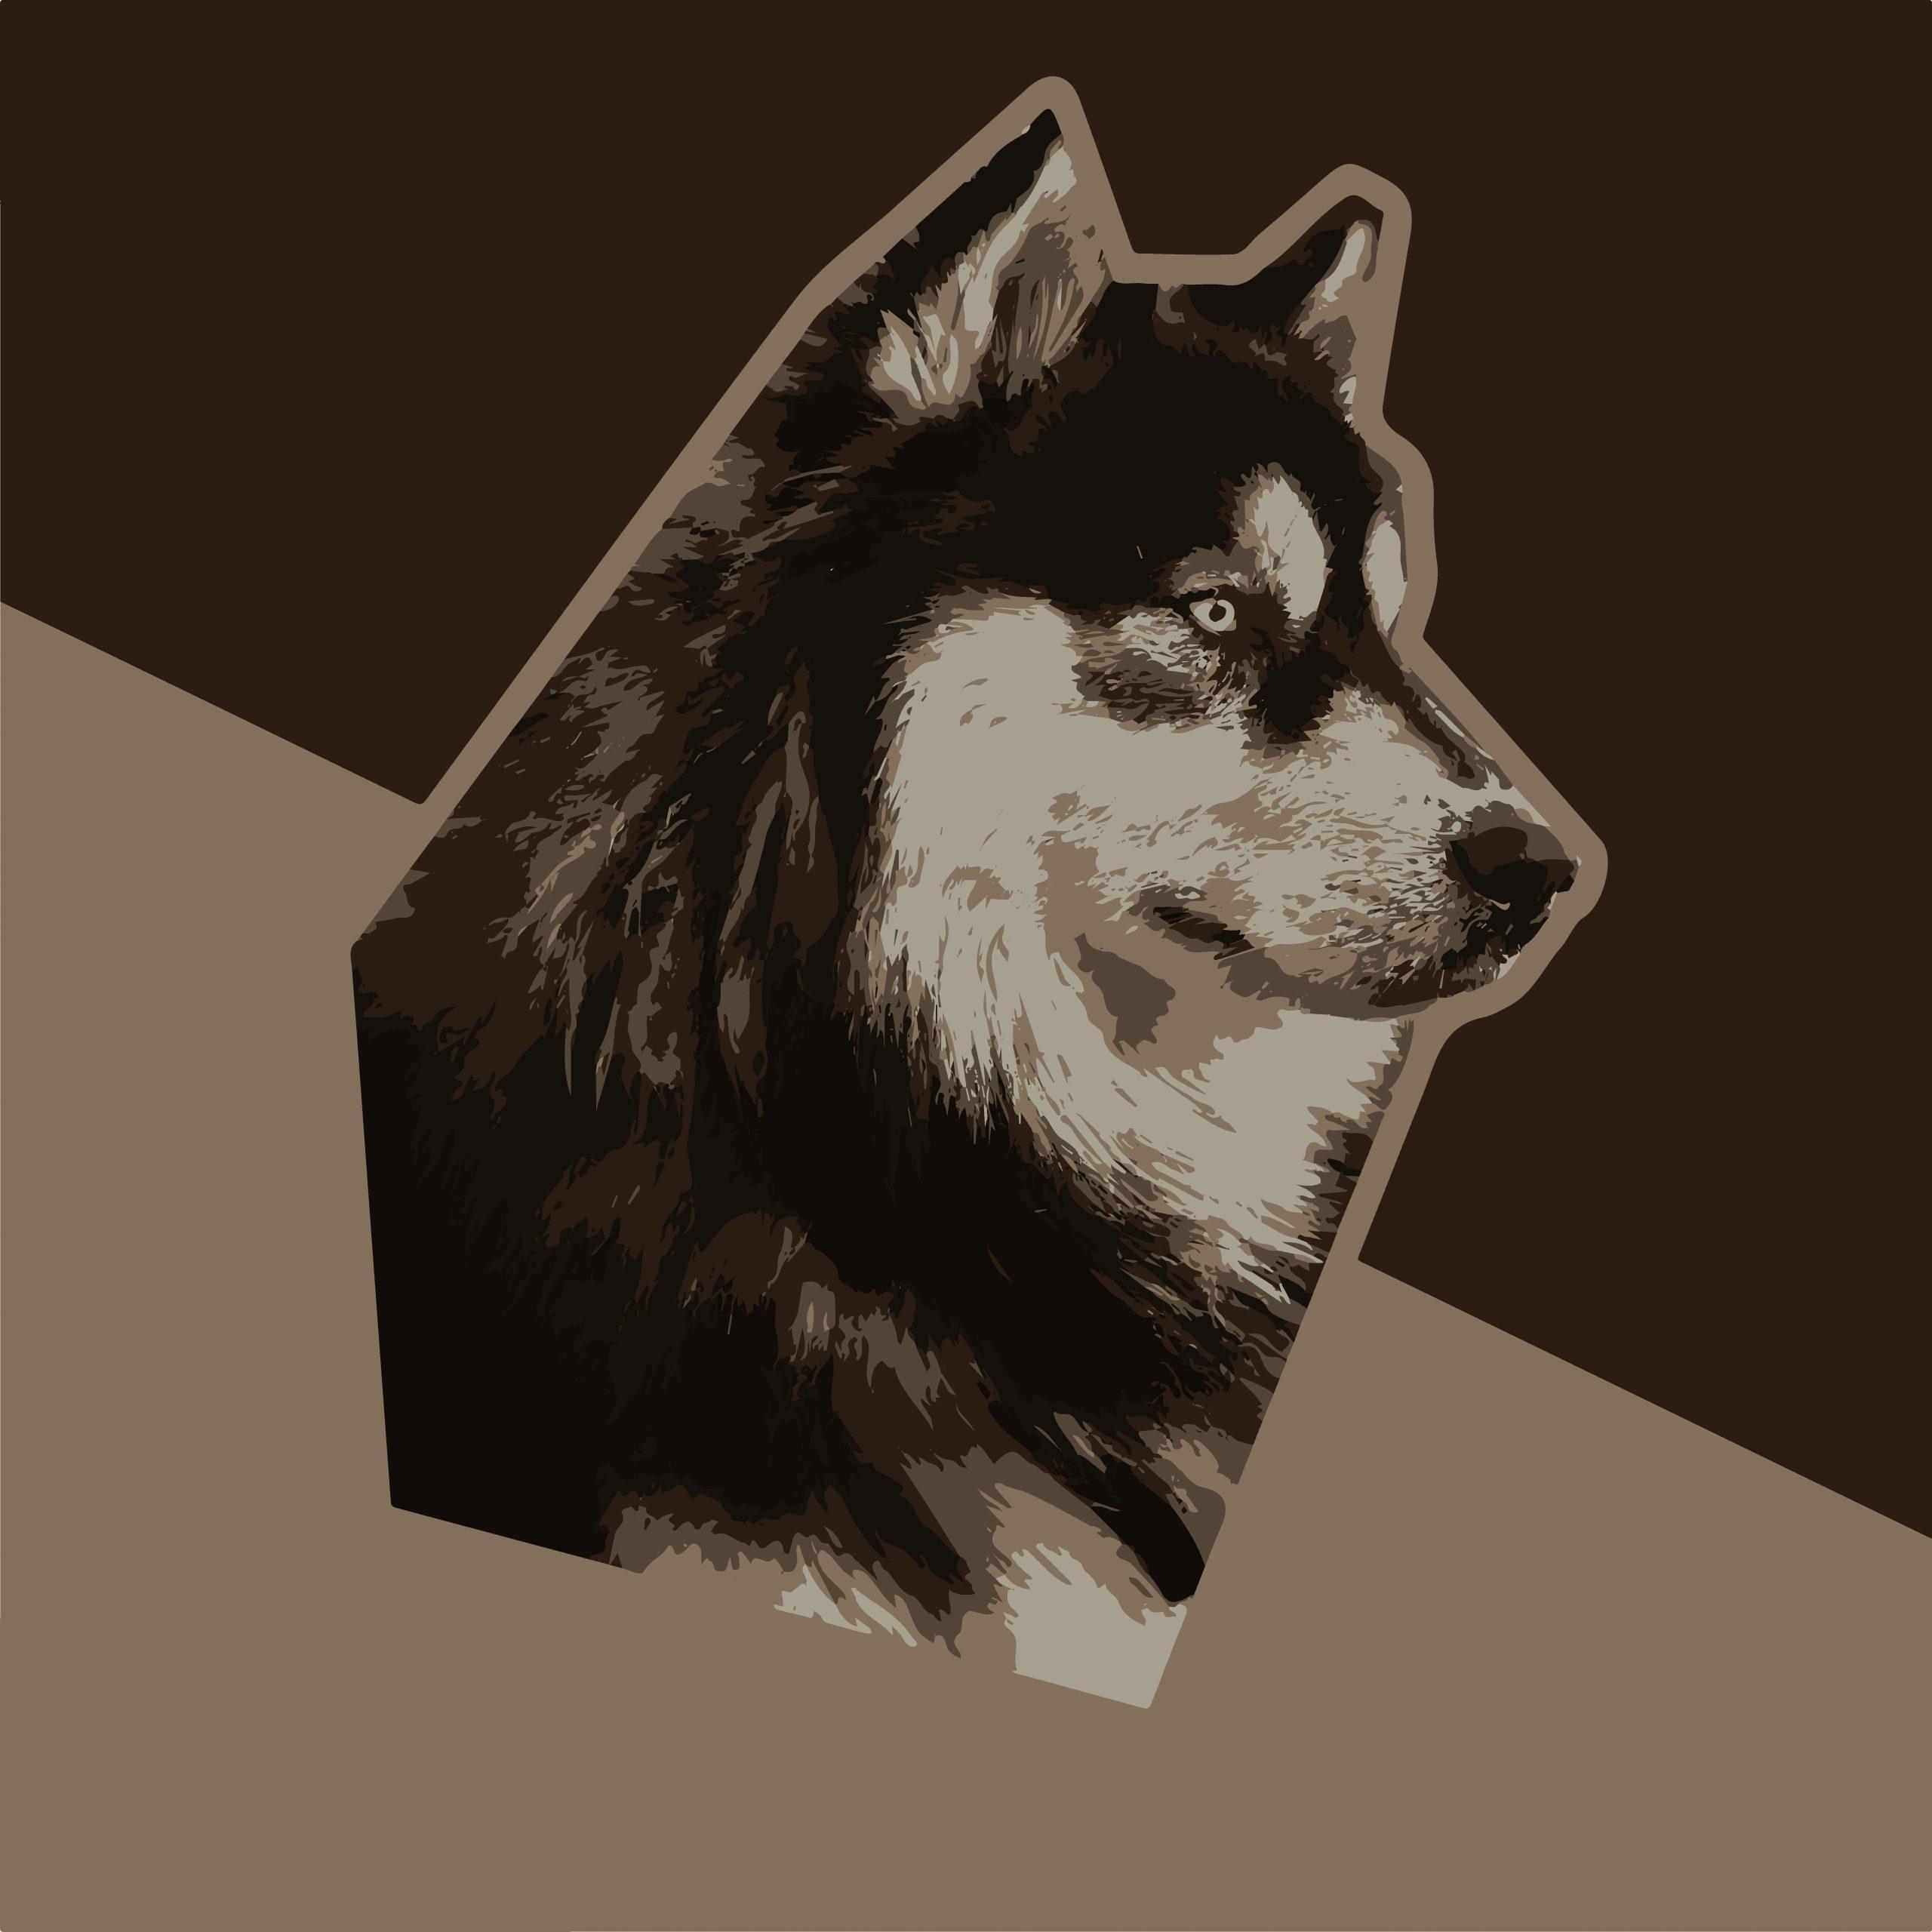 Illustration of Siberian husky dog